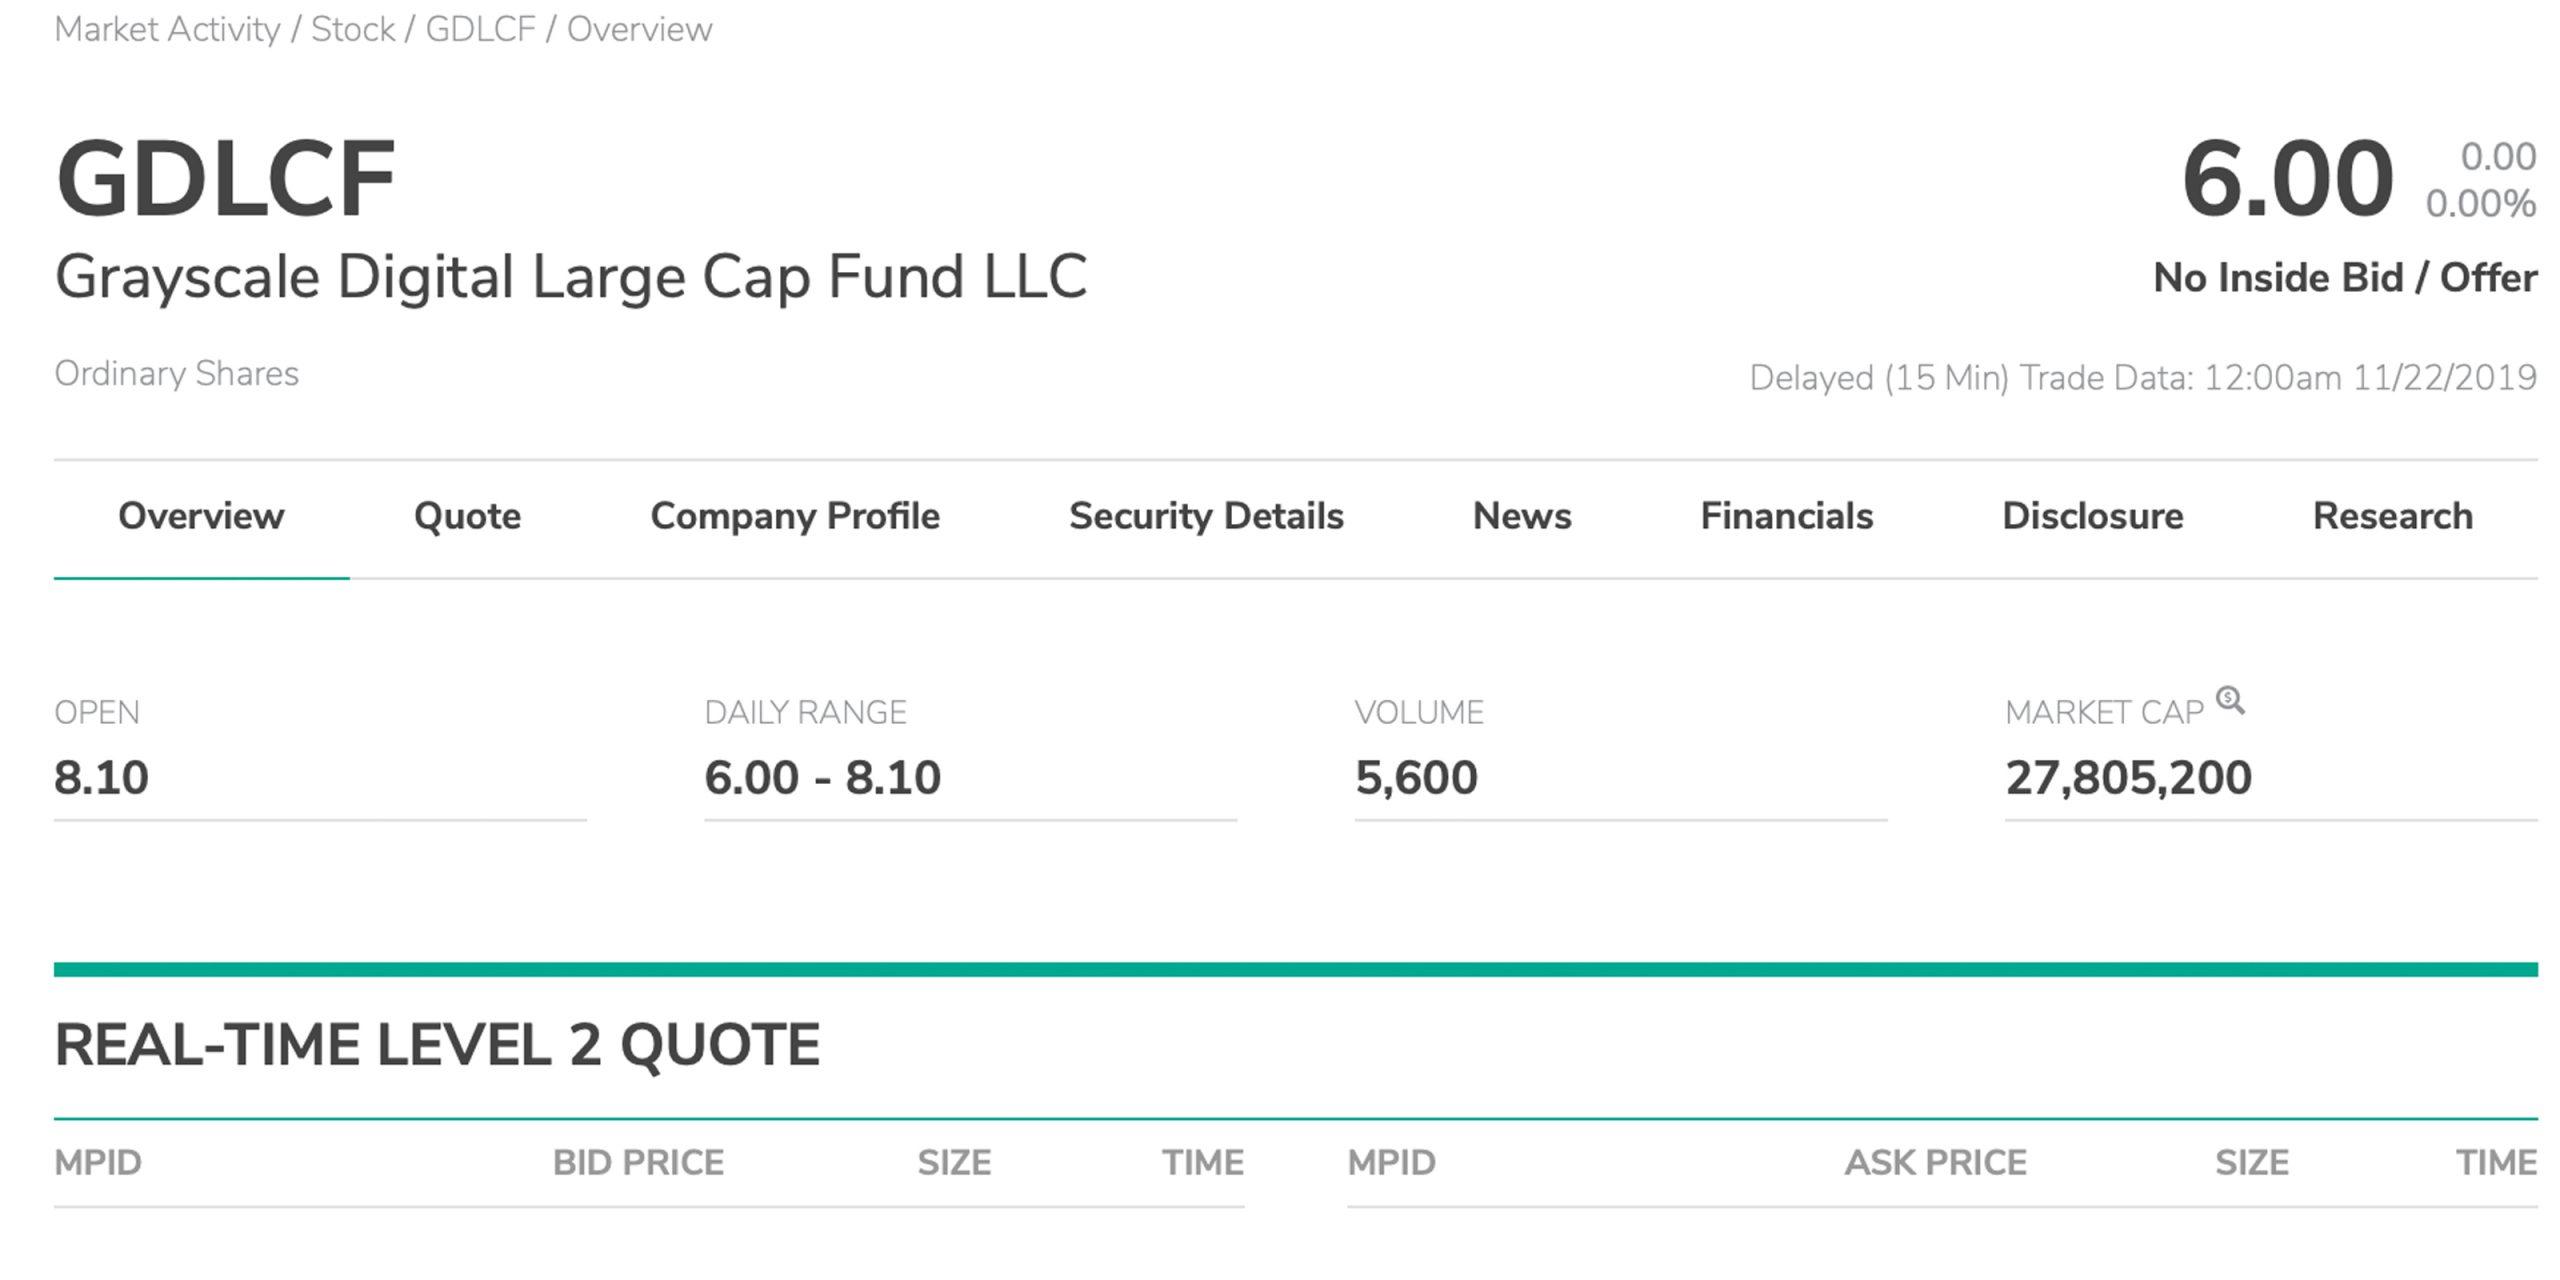 "La plataforma OTC de Grayscale comienza a comercializar fondos diversificados de gran capitalización ""ancho ="" 2560 ""height ="" 1280 ""srcset ="" https://blackswanfinances.com/wp-content/uploads/2019/11/gdlcfqut-scaled.jpg 2560w, https://news.bitcoin.com/wp-content /uploads/2019/11/gdlcfqut-300x150.jpg 300w, https://news.bitcoin.com/wp-content/uploads/2019/11/gdlcfqut-1024x512.jpg 1024w, https://news.bitcoin.com /wp-content/uploads/2019/11/gdlcfqut-768x384.jpg 768w, https://news.bitcoin.com/wp-content/uploads/2019/11/gdlcfqut-1536x768.jpg 1536w, https: // noticias .bitcoin.com / wp-content / uploads / 2019/11 / gdlcfqut-2048x1024.jpg 2048w, https://news.bitcoin.com/wp-content/uploads/2019/11/gdlcfqut-696x348.jpg 696w, https : //news.bitcoin.com/wp-content/uploads/2019/11/gdlcfqut-1392x696.jpg 1392w, https://news.bitcoin.com/wp-content/uploads/2019/11/gdlcfqu t-1068x534.jpg 1068w, https://news.bitcoin.com/wp-content/uploads/2019/11/gdlcfqut-840x420.jpg 840w, https://news.bitcoin.com/wp-content/uploads/ 2019/11 / gdlcfqut-1920x960.jpg 1920w ""tamaños ="" (ancho máximo: 2560px) 100vw, 2560px"